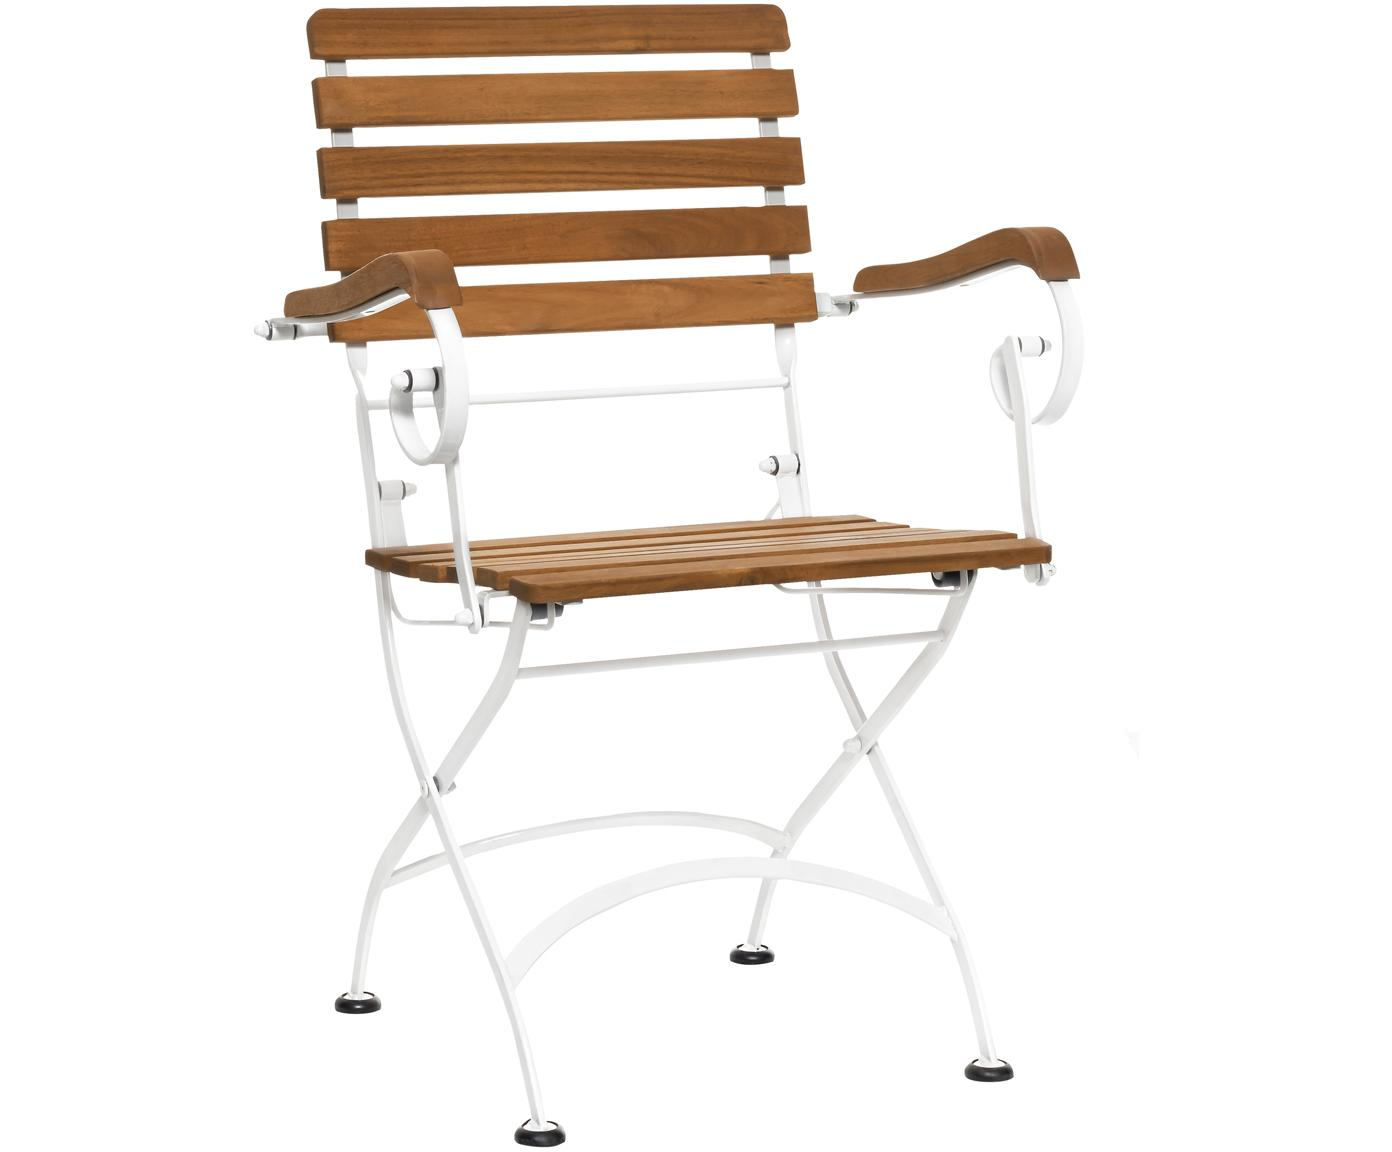 Sillas plegables con reposabrazos Parklife, 2uds., Asiento: madera de acacia aceitada, Estructura: metal galvanizado con pin, Blanco, madera de acacia, An 59x F 52 cm